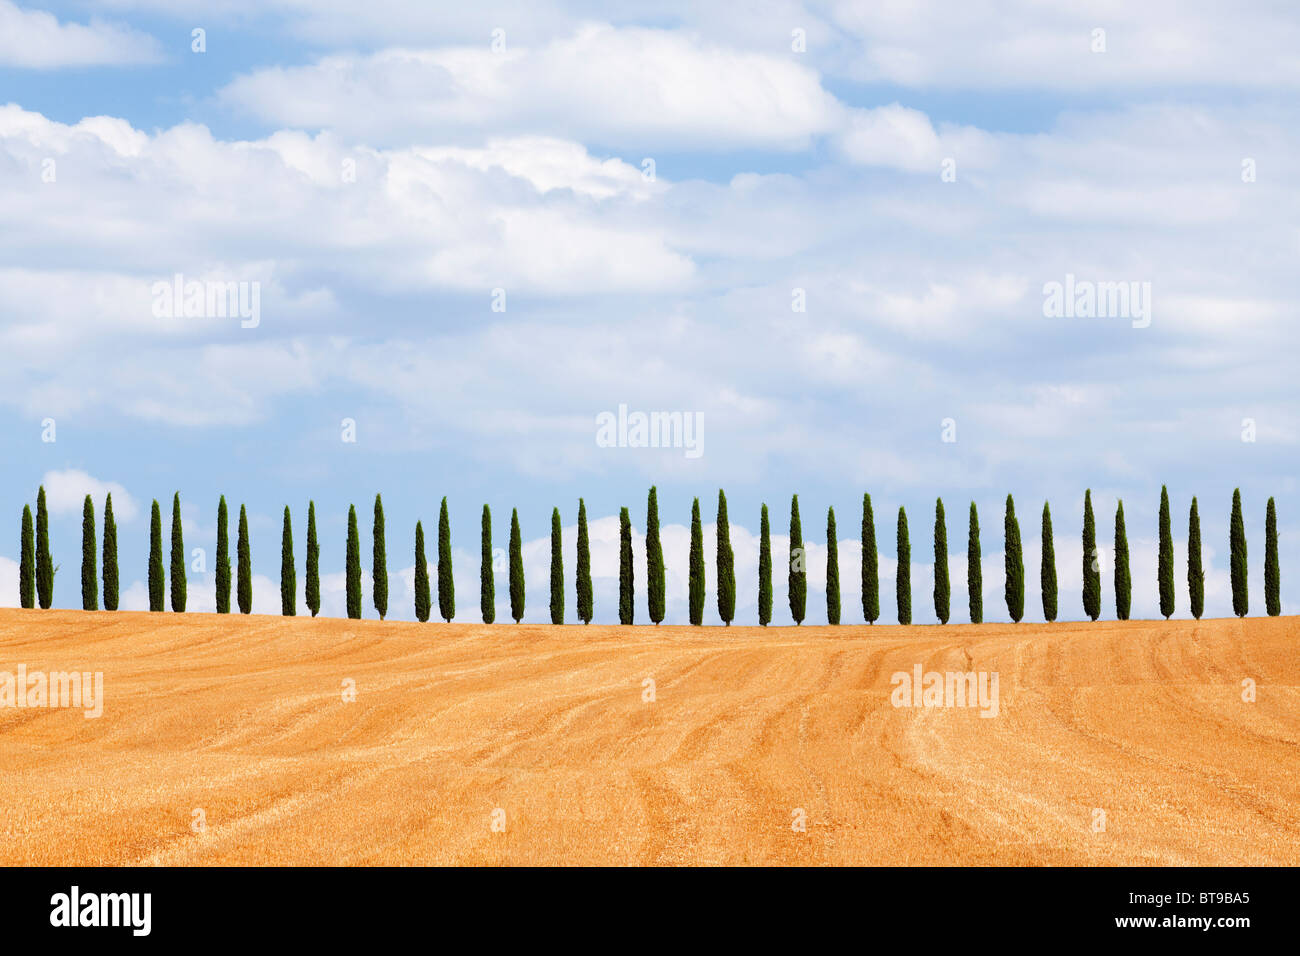 Cypress trees on hill, Tuscany, Italy - Stock Image